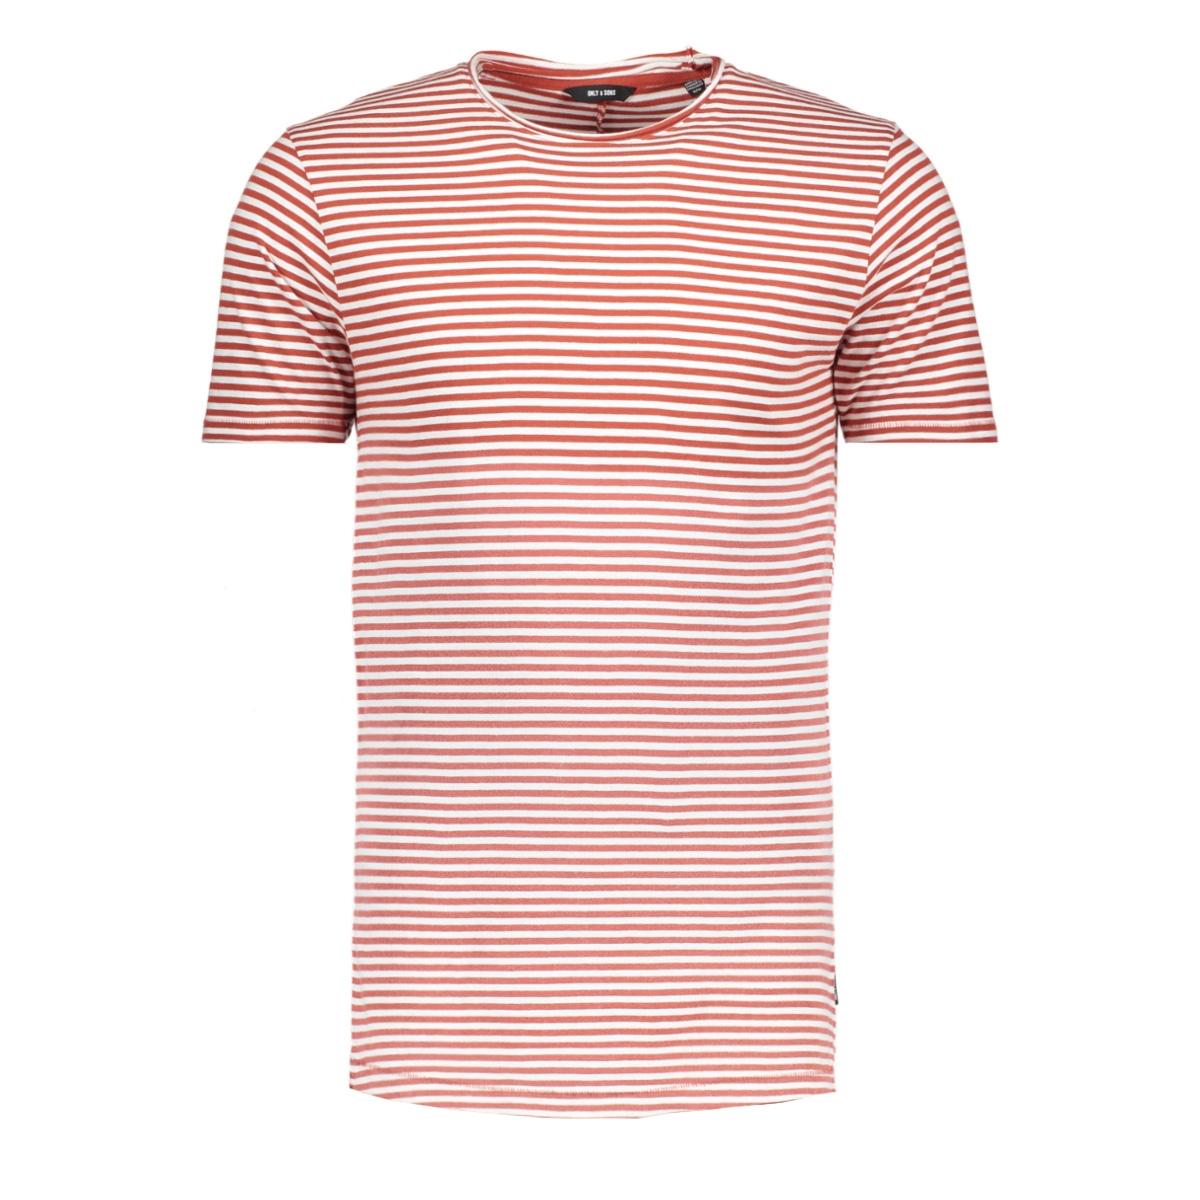 onshanson bleached striped tee 22011588 only & sons t-shirt cloud dancer/bossa nova